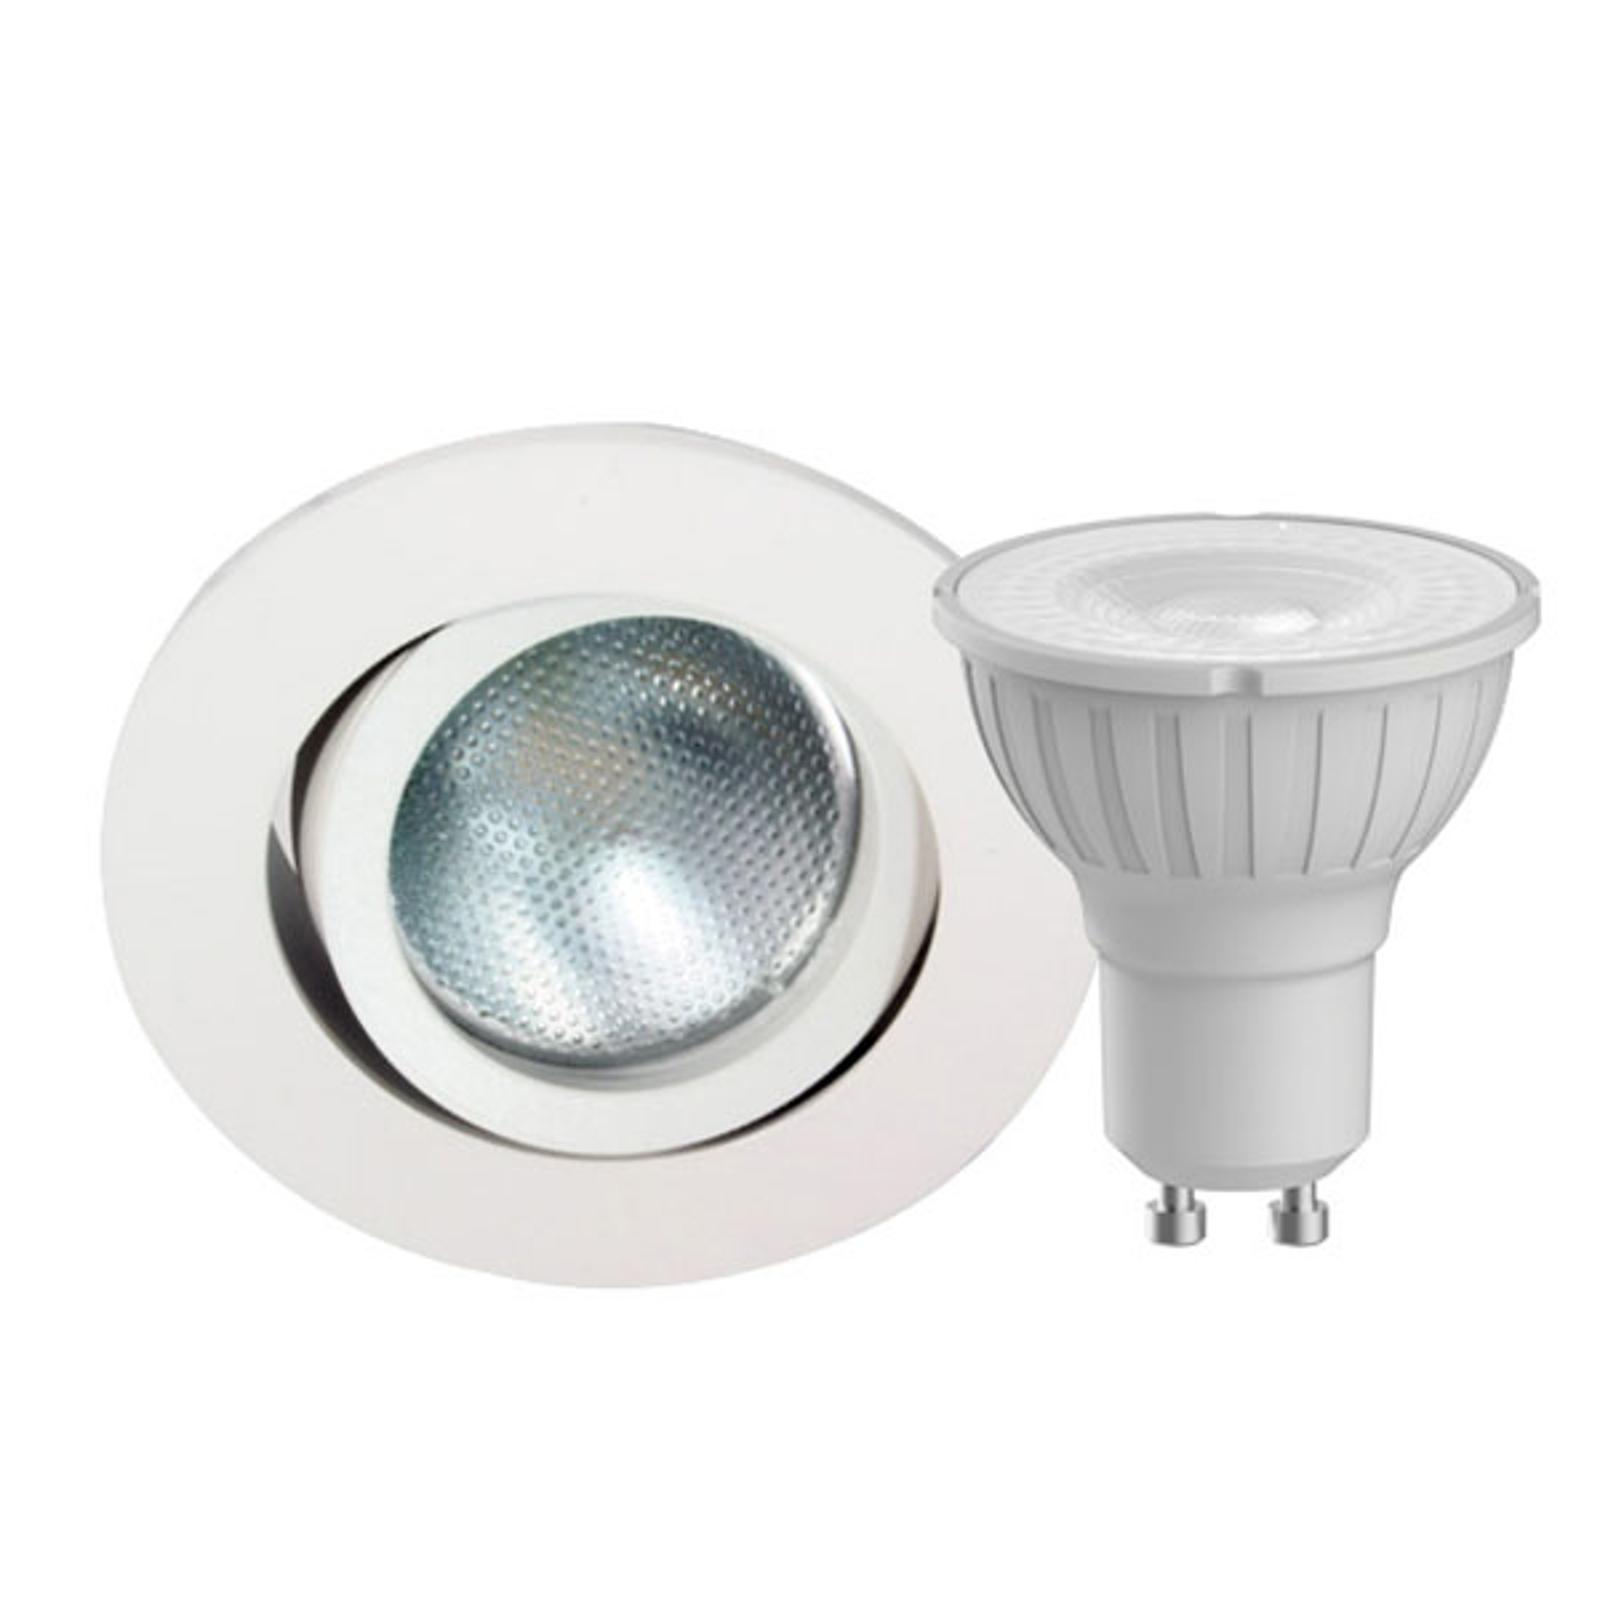 Megaman DecoclicSet -LED-spotti GU10 5W valkoinen